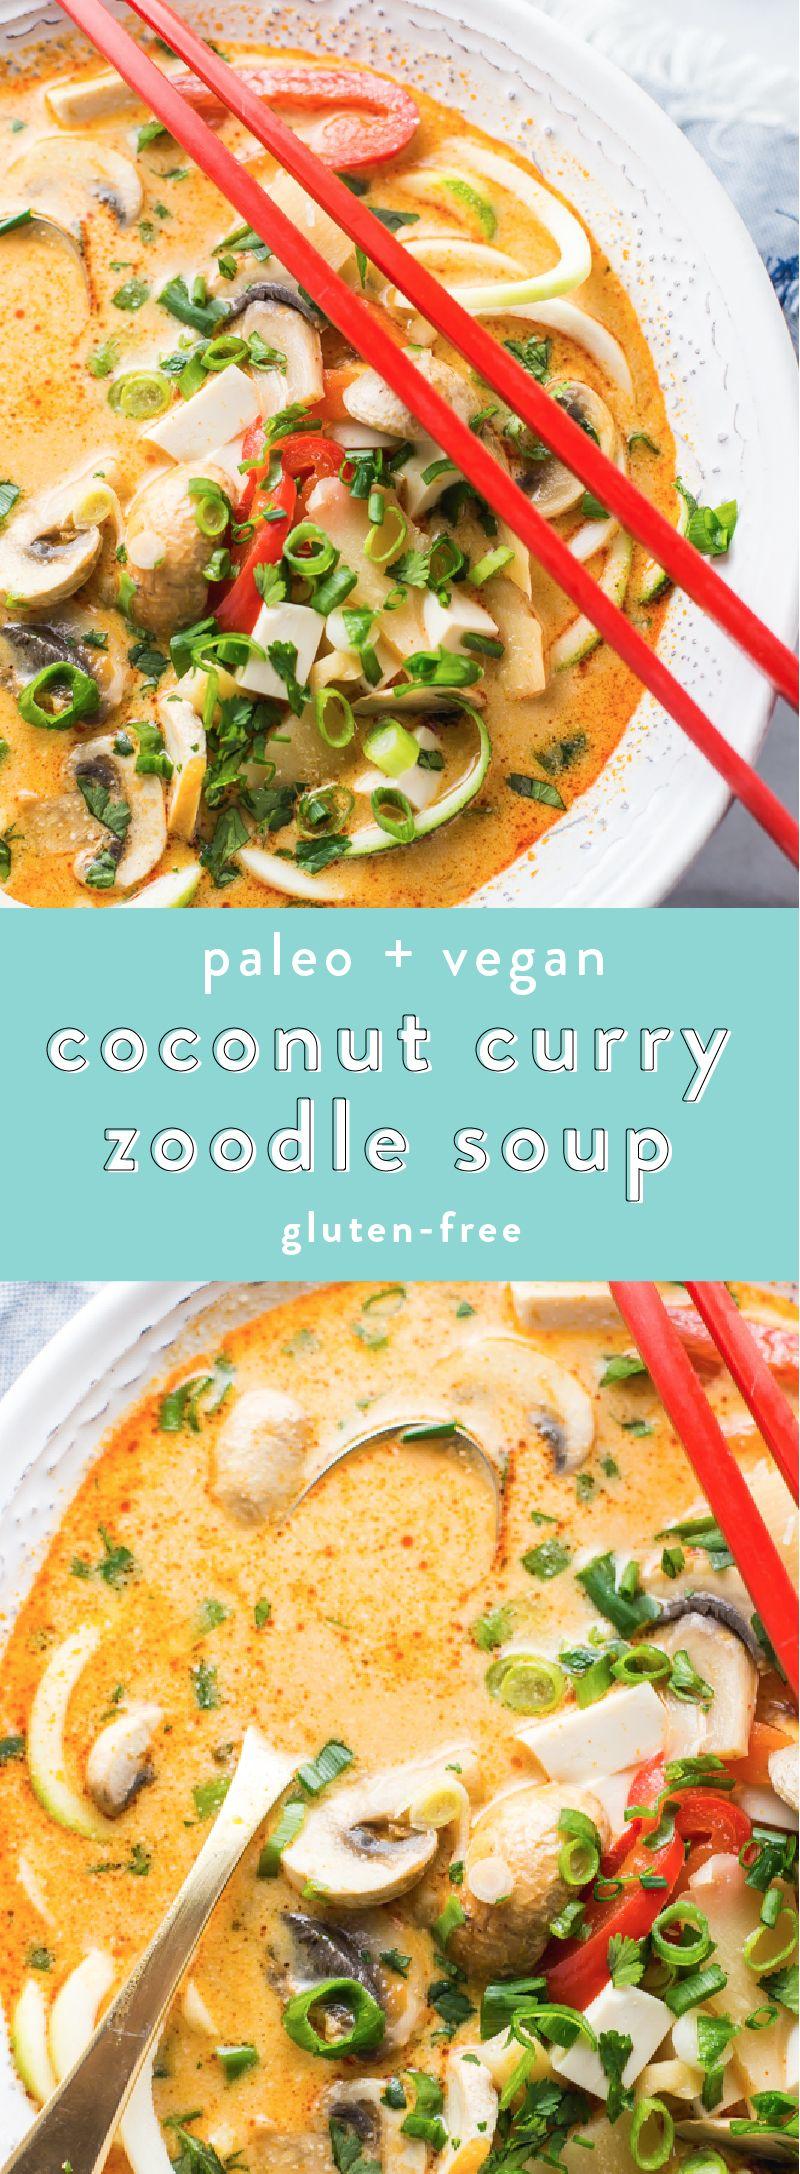 Paleo Coconut Curry Zoodle Soup